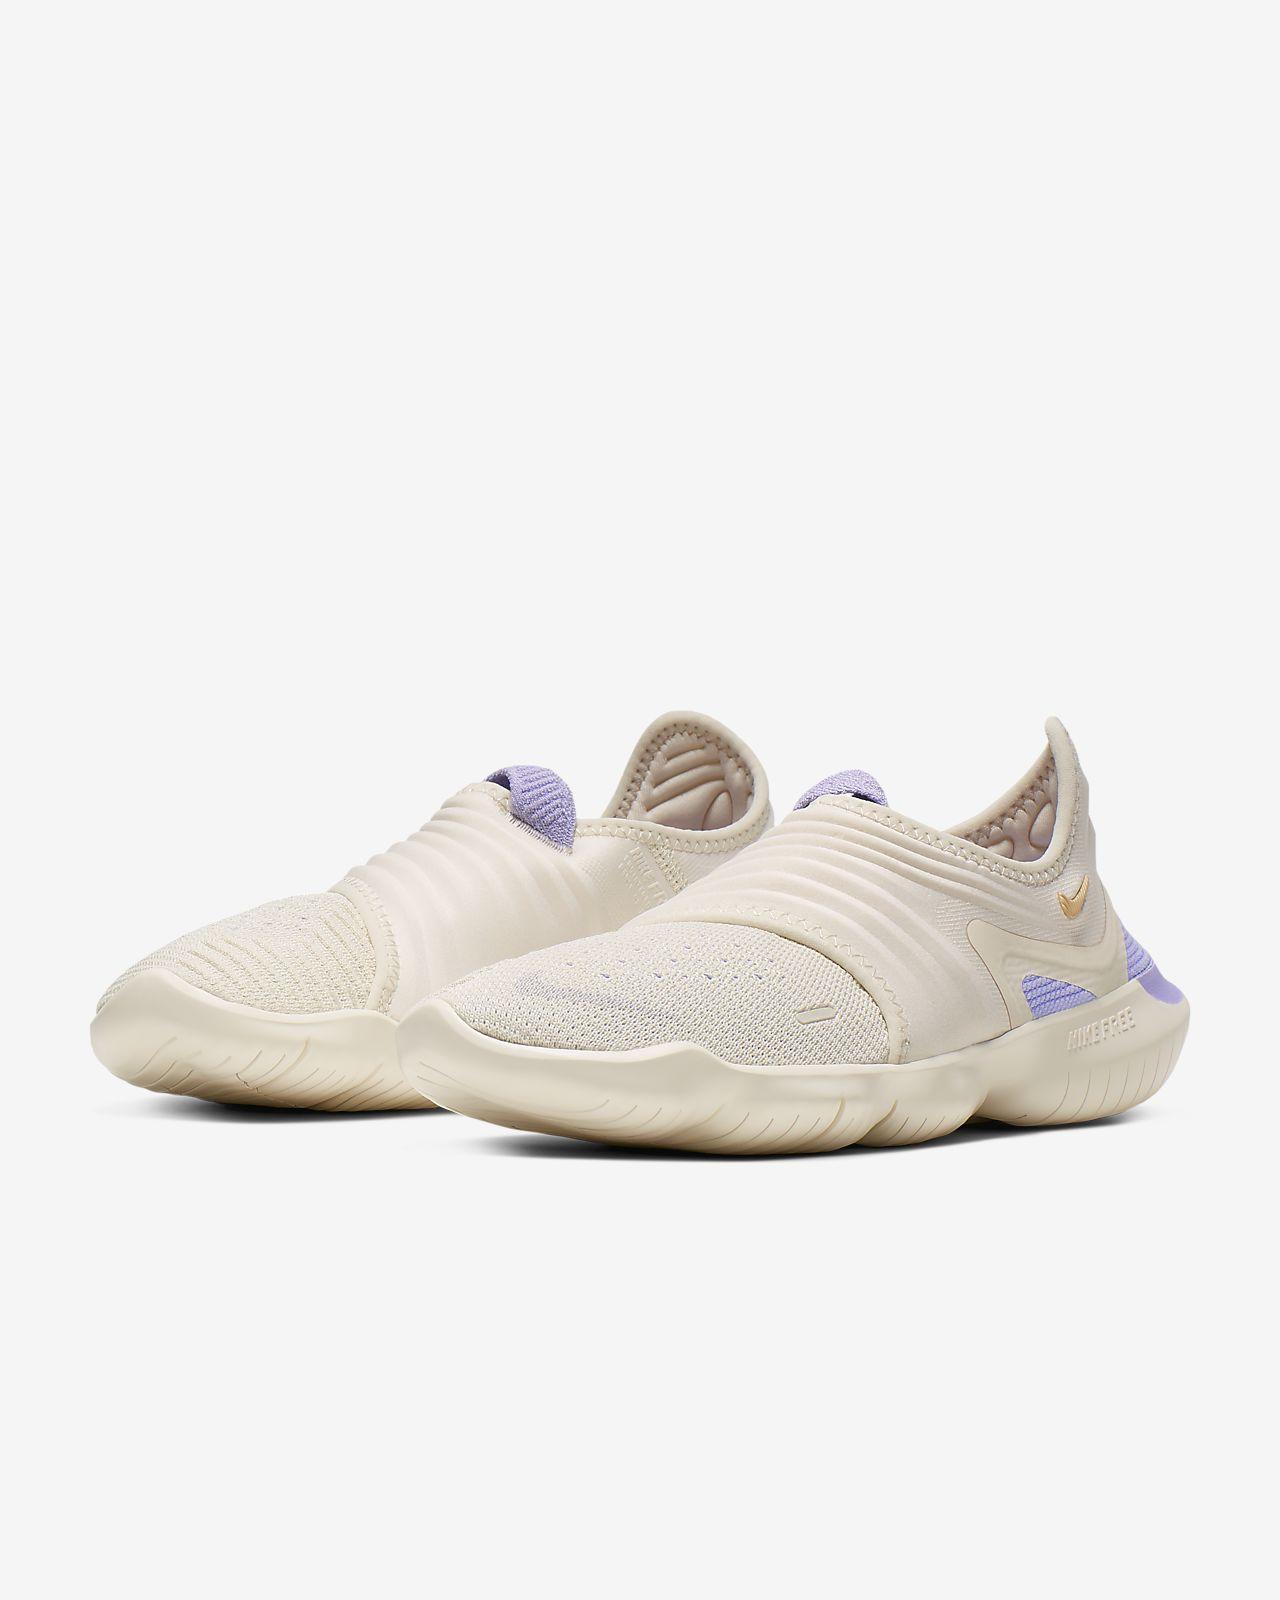 eeaff758d1ba0 Nike Free RN Flyknit 3.0 Women's Running Shoe. Nike.com AU